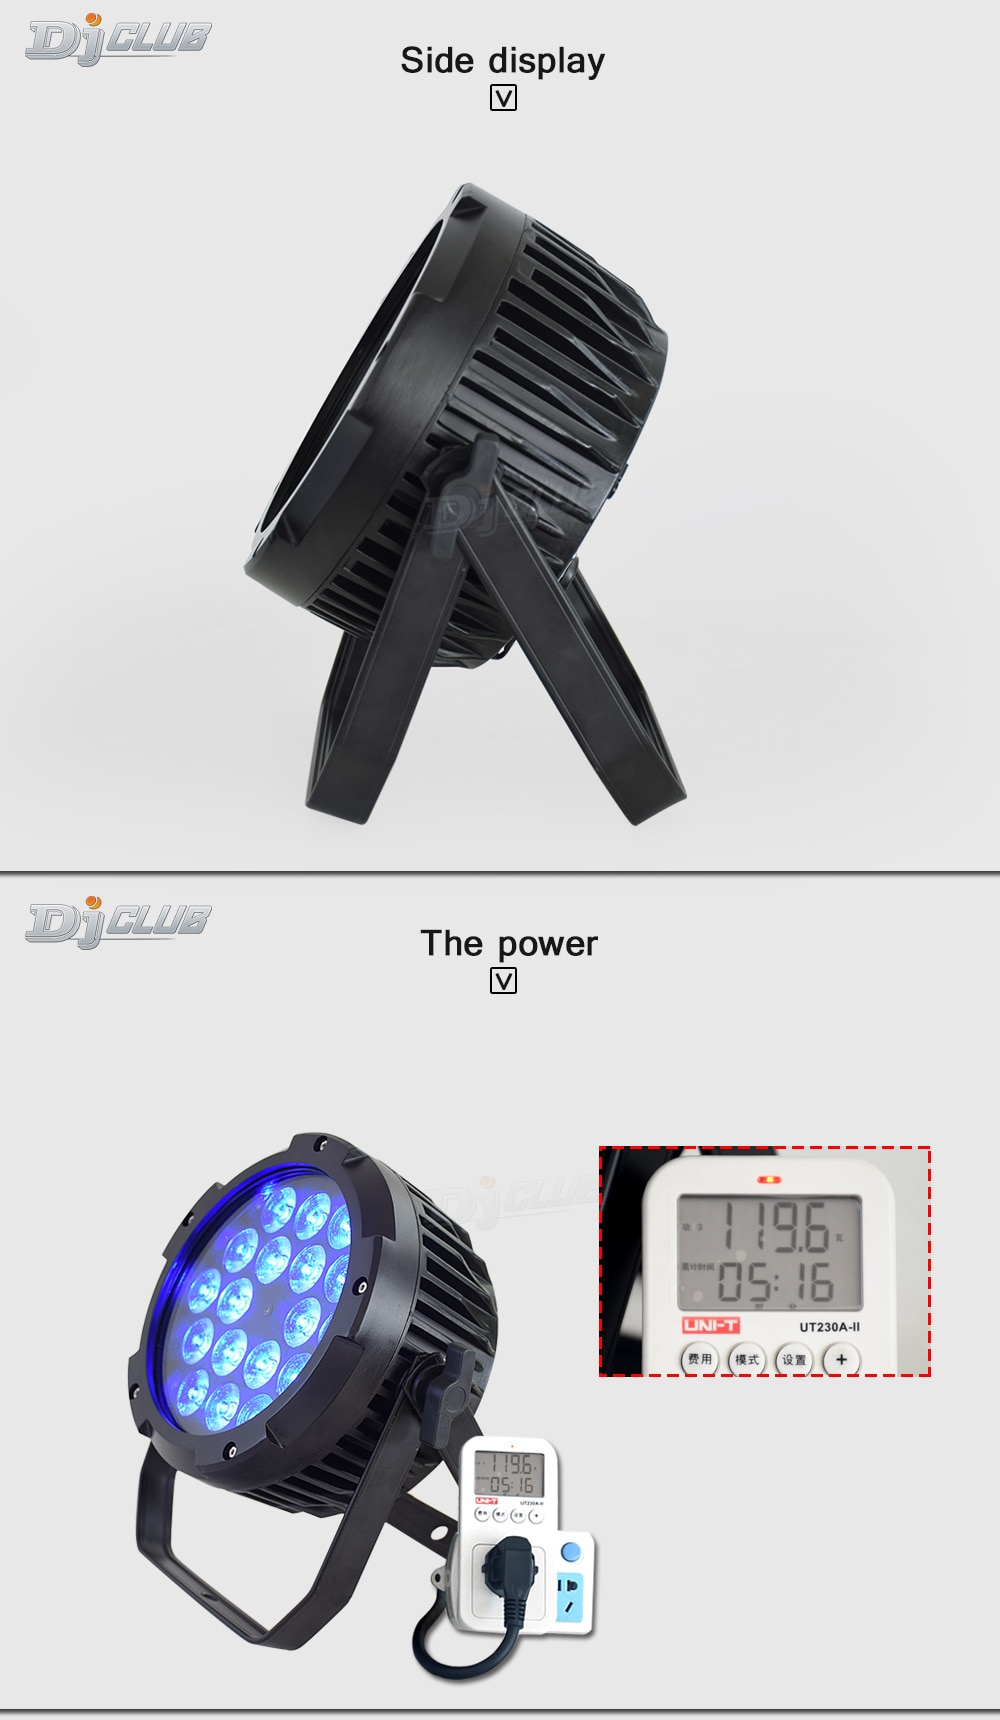 LED Par Can Uplighting Waterpoor Outdoor Buliding Falt Par 18X18 Watt RGBWA UA Colors Lyre Wash 6In1 For Dmx Stage Lighting